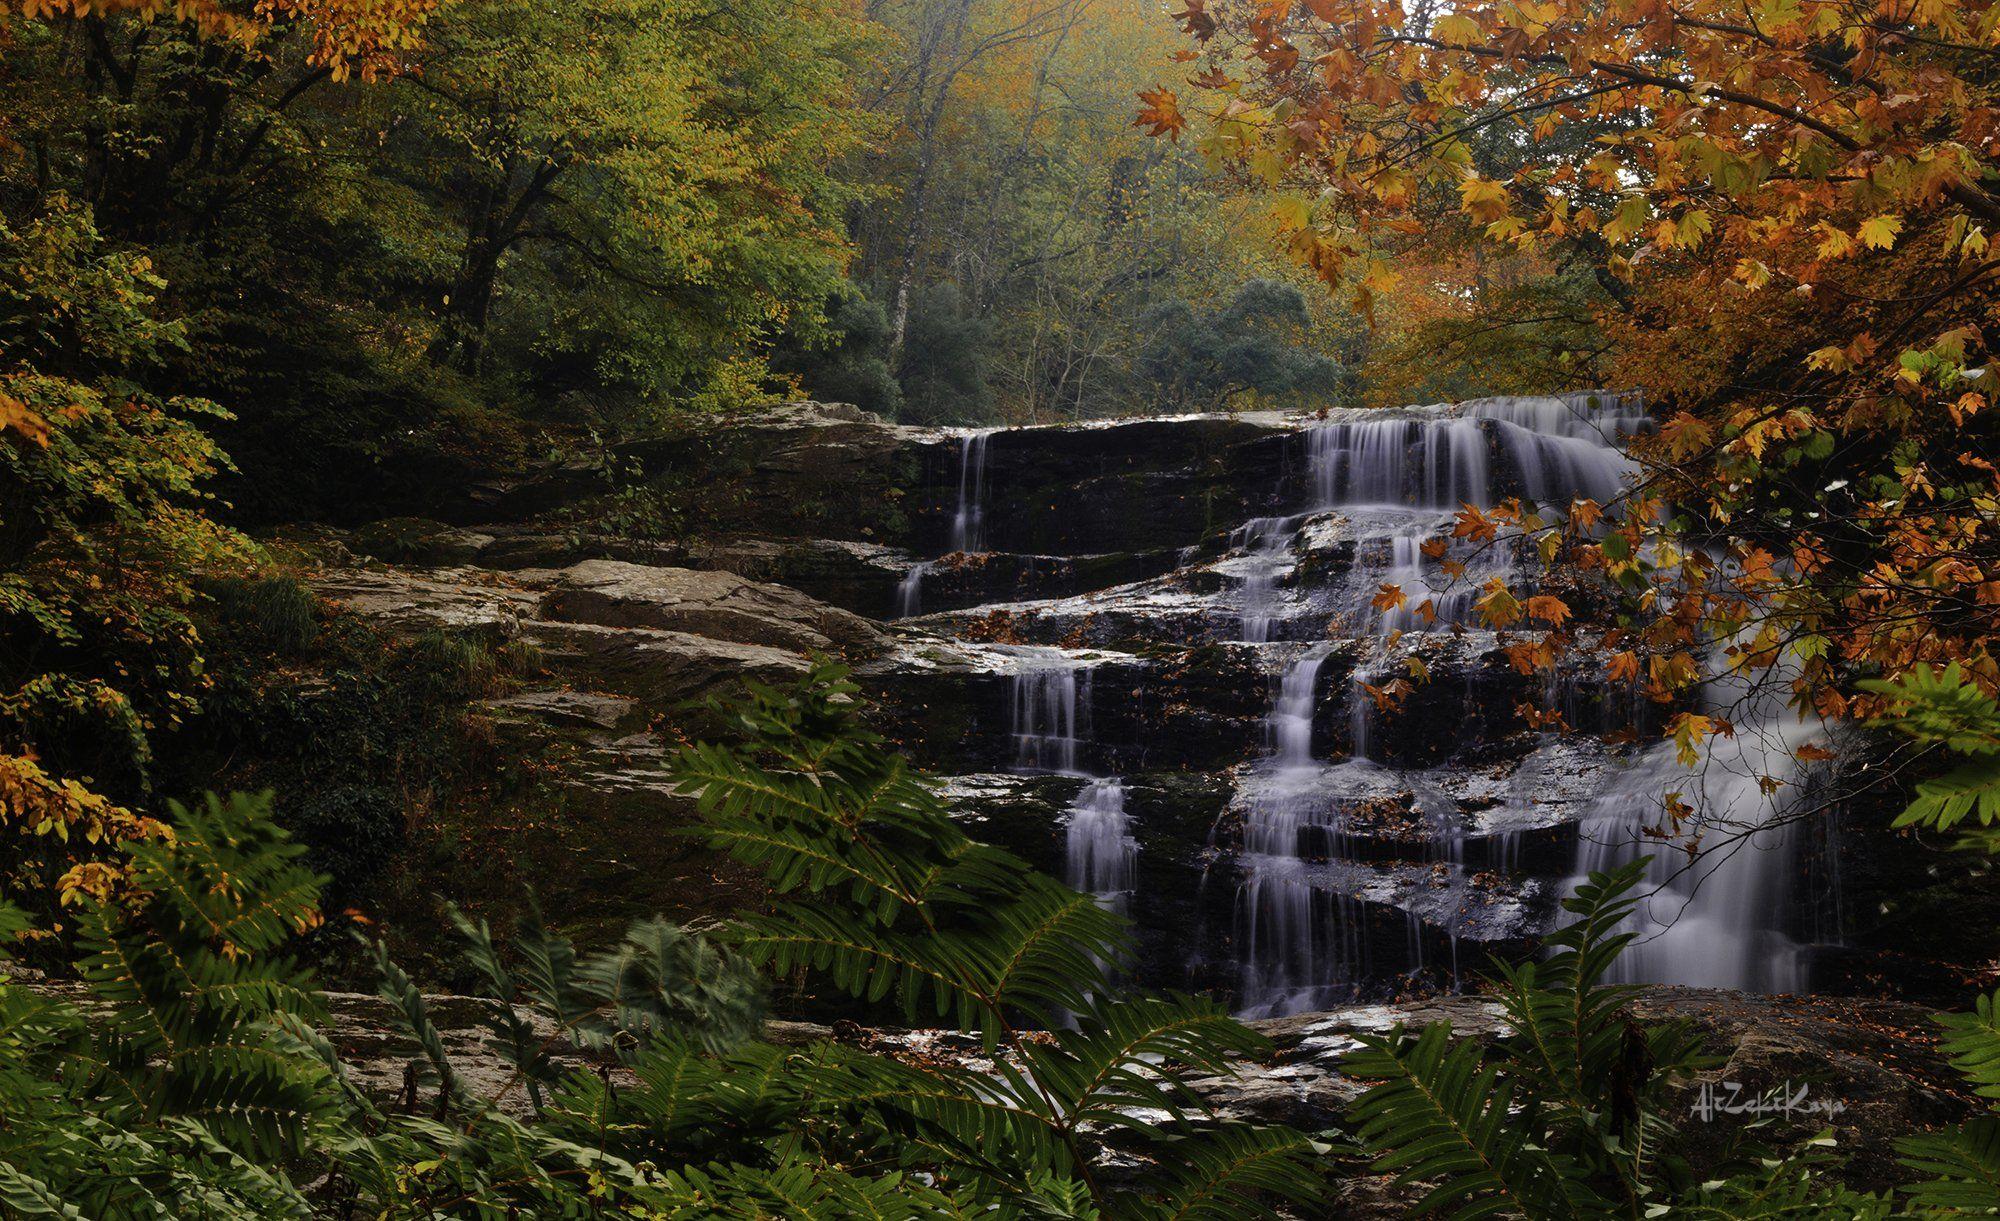 #autumn #colors #suuctu #waterfall, Ali Zeki Kaya